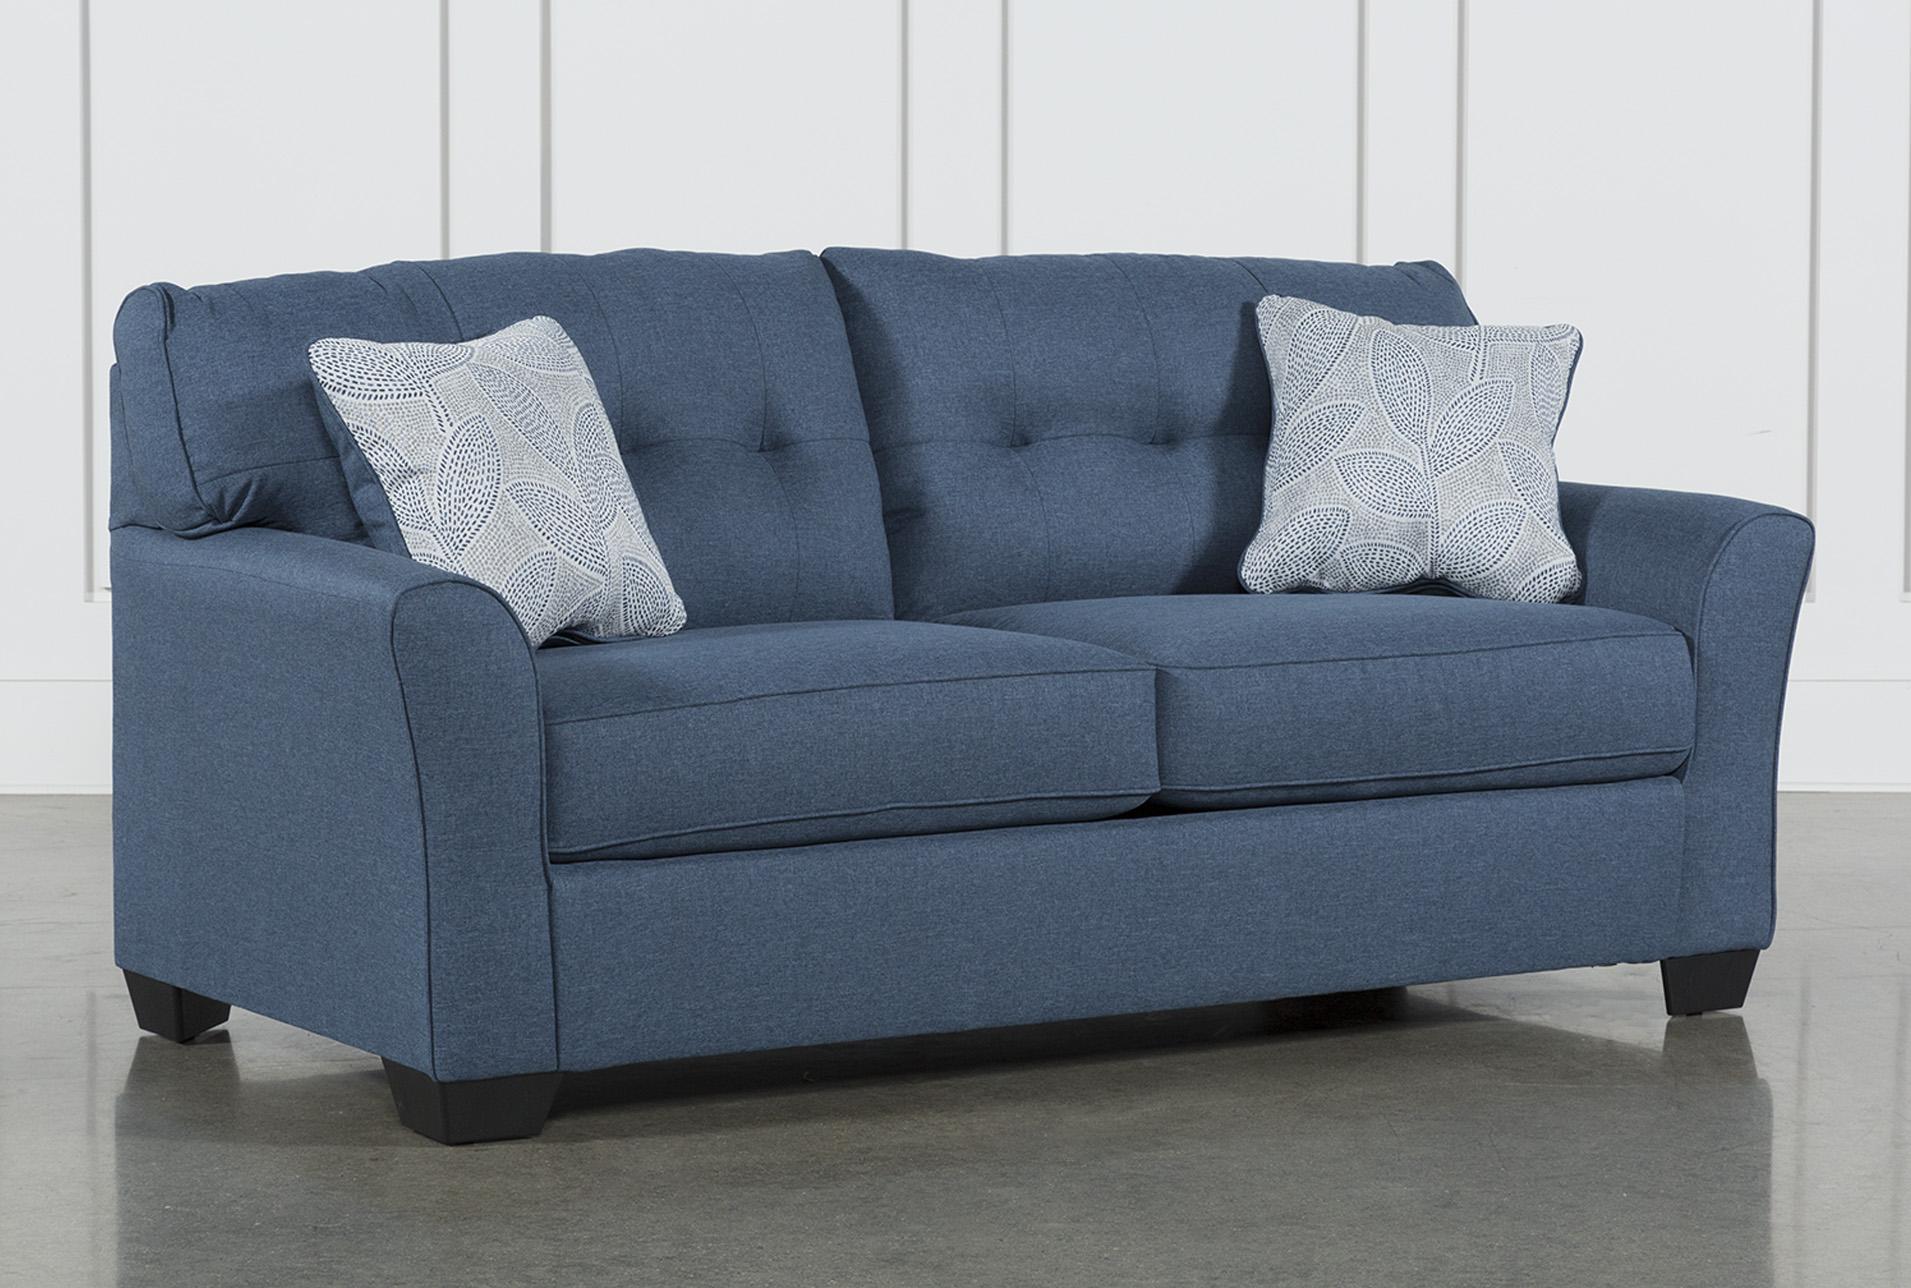 jacoby denim sofa living spaces rh livingspaces com blue denim sofas for sale blue denim sofa bed